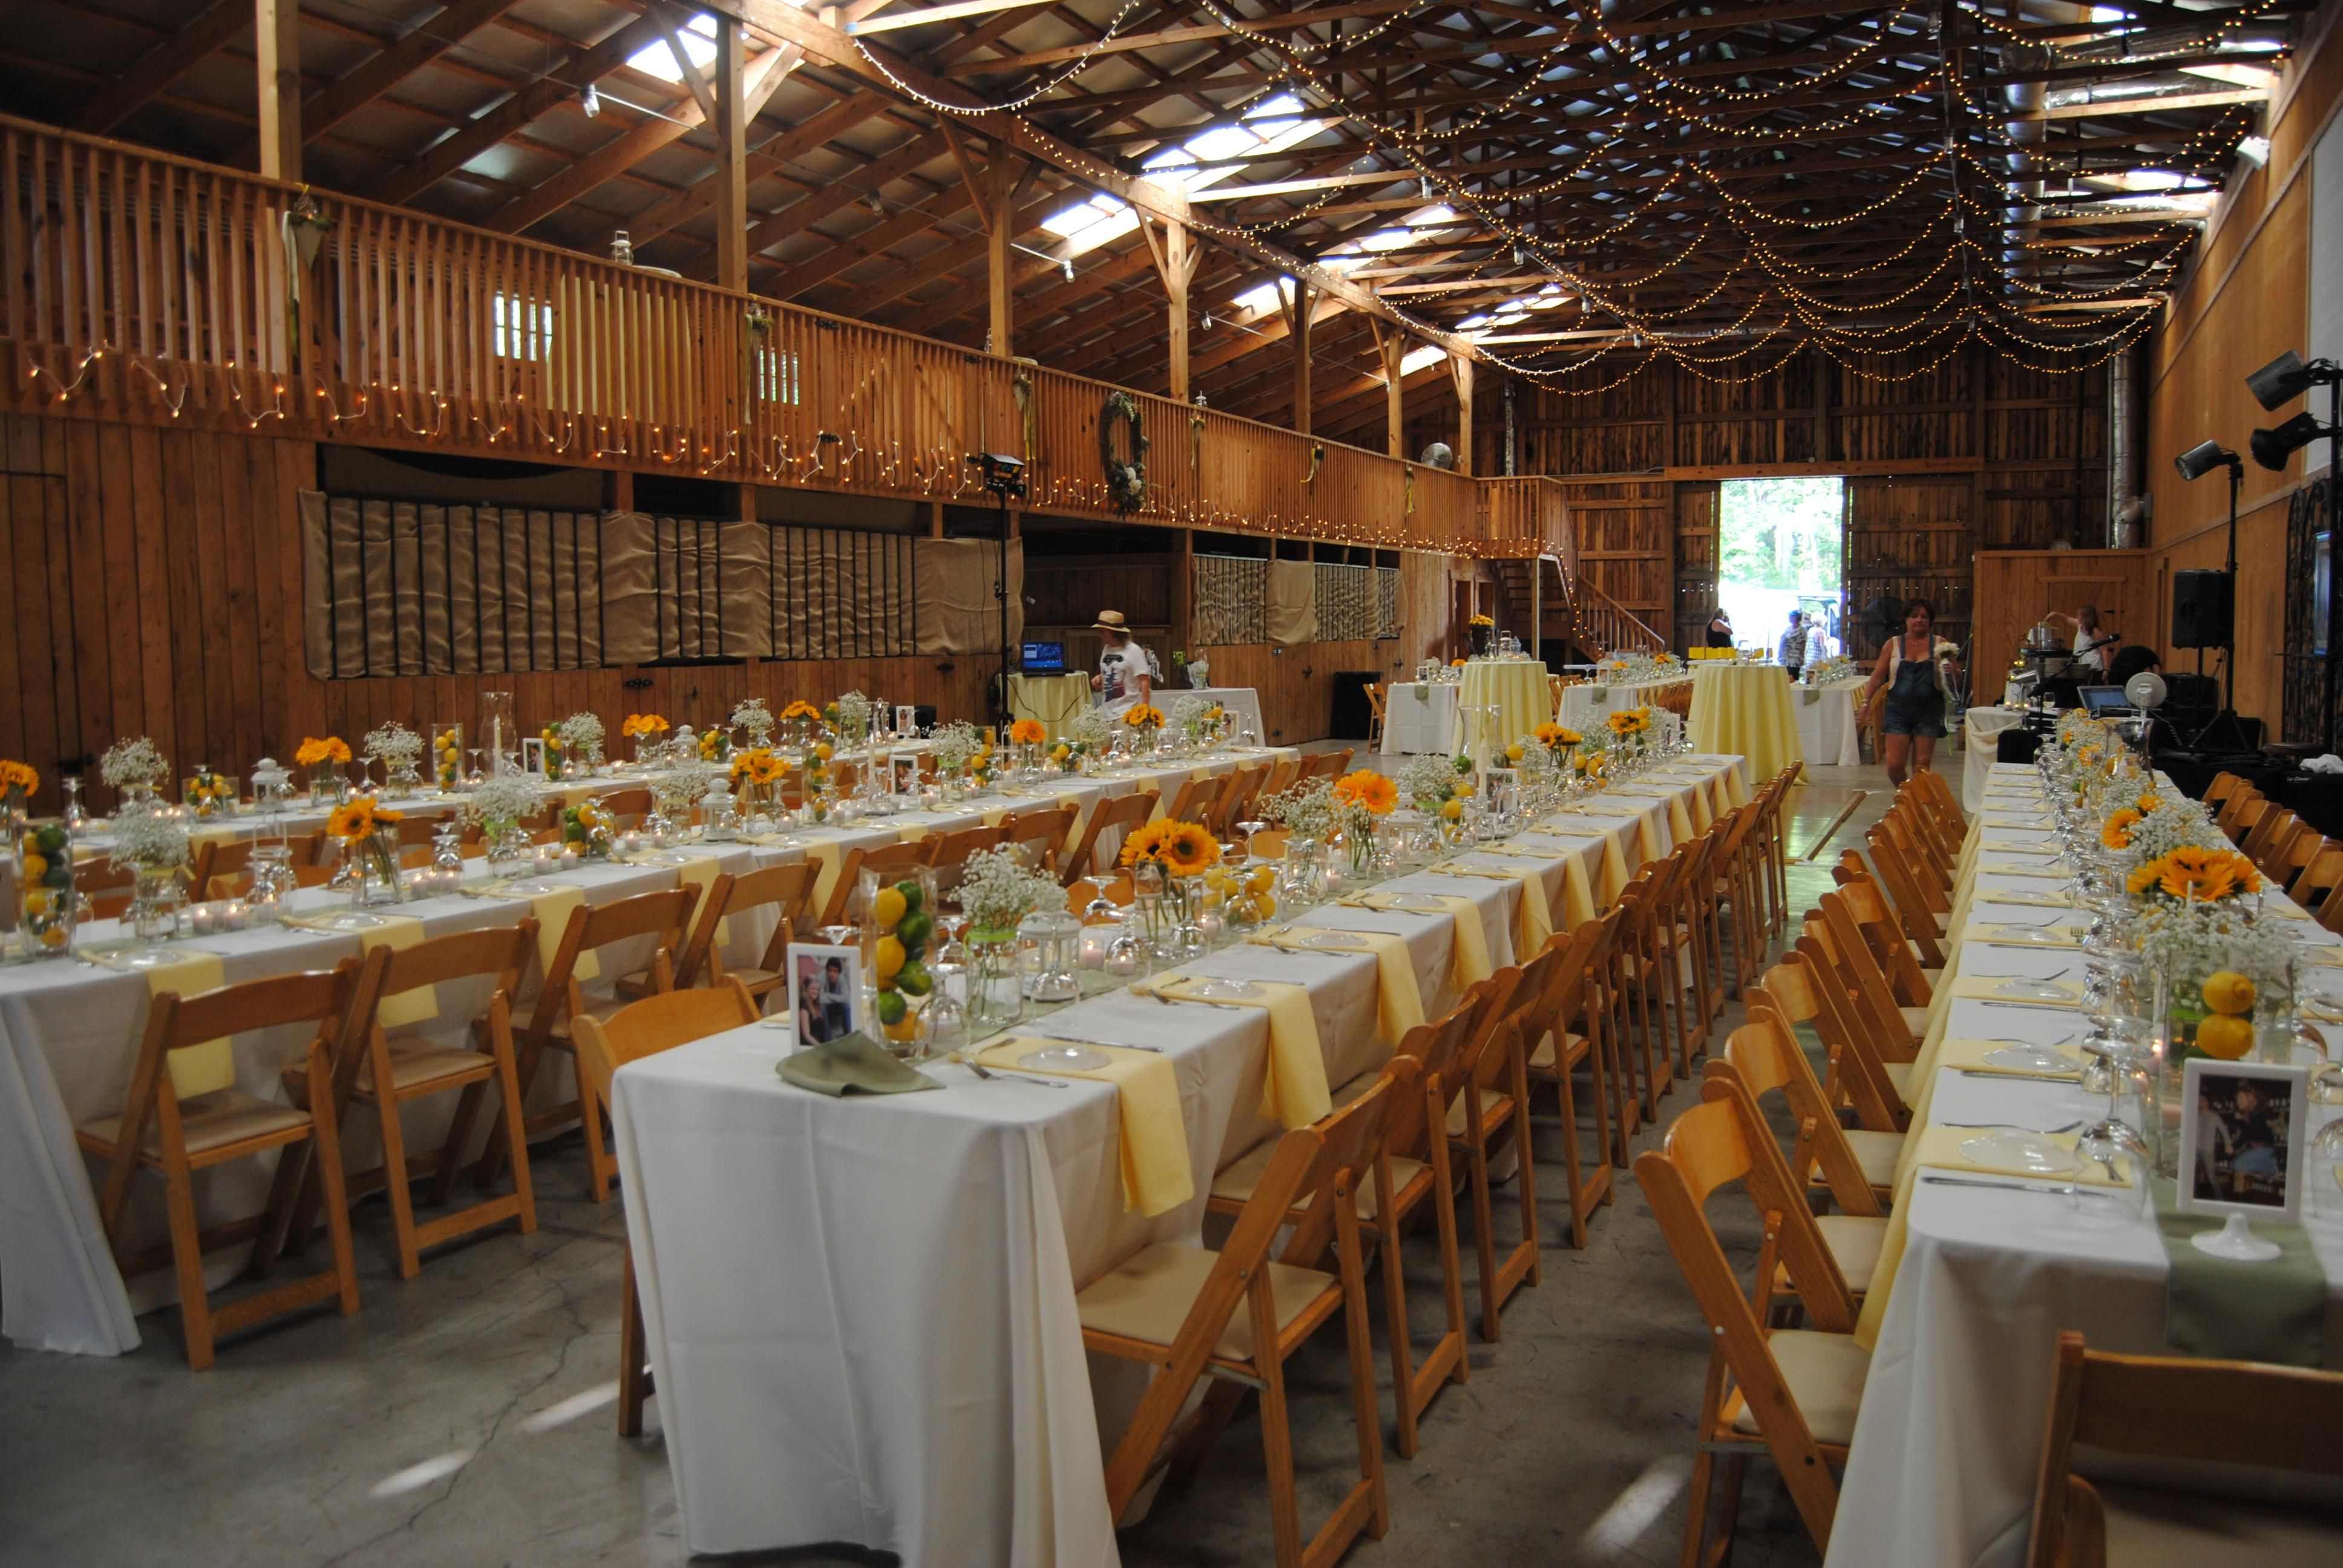 Casual Wedding Reception Ideas | Chic Rustique! What A Fabulous Farm For A  Wedding Reception